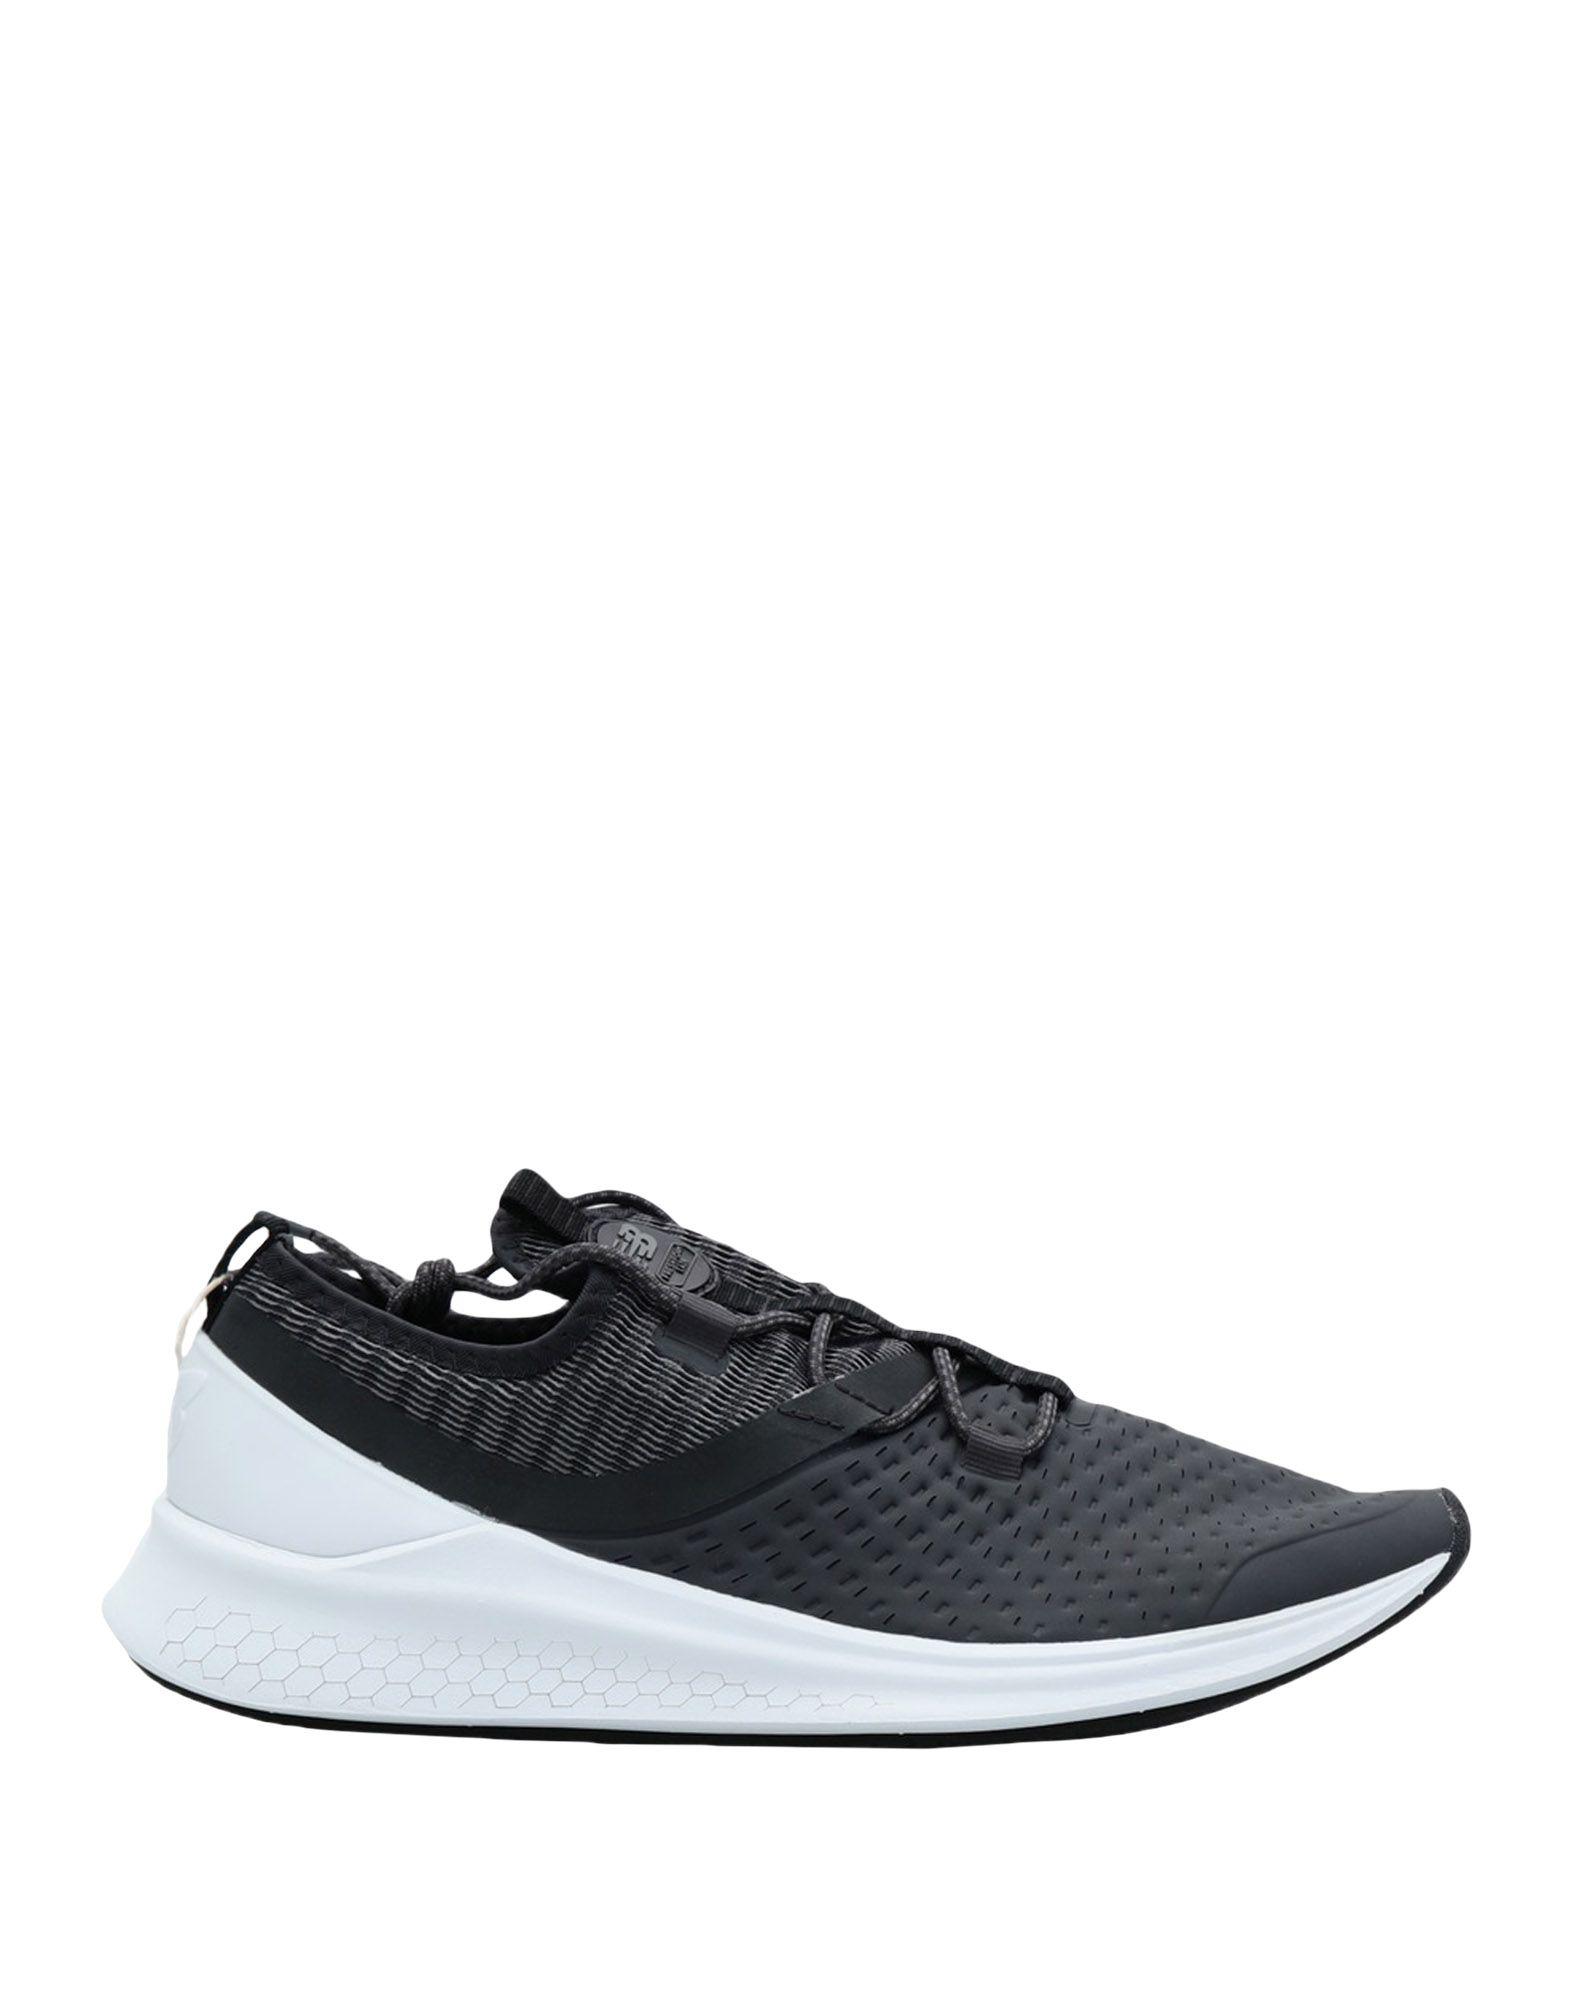 New Balance Fresh Foam Lazr Hyposkin  11470669LP Heiße Schuhe